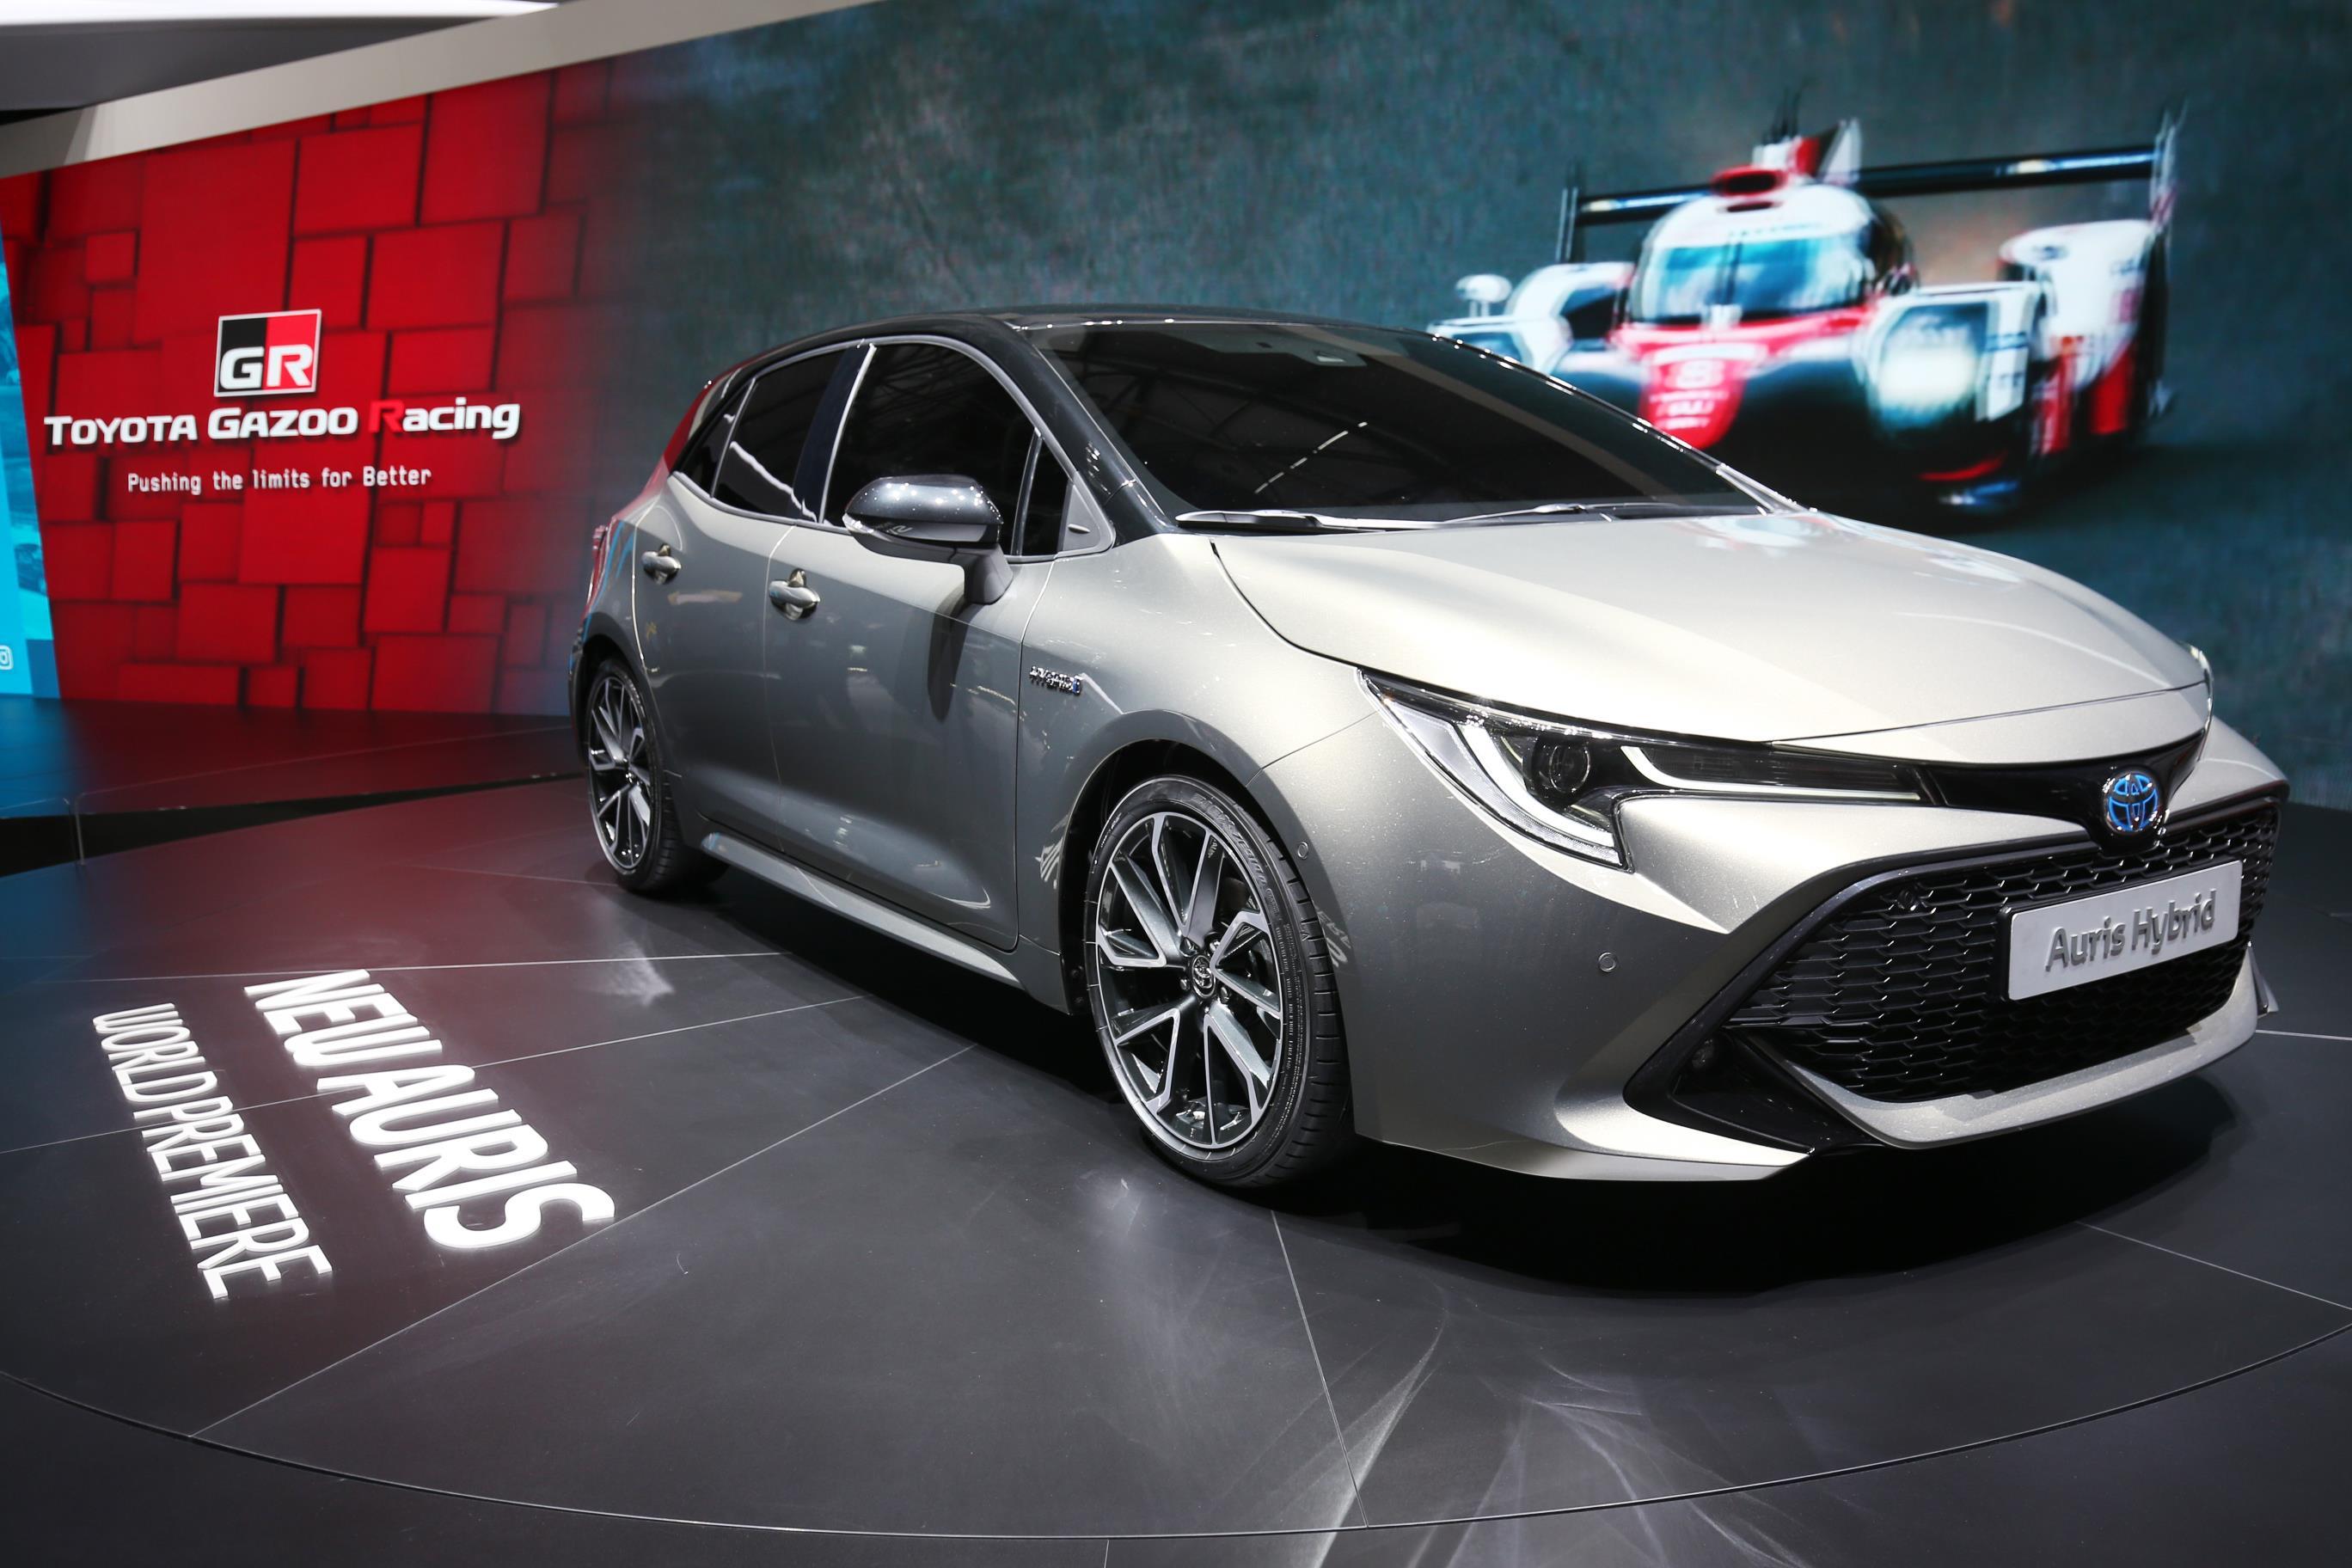 Geneva Motor Show 2018 Mega Gallery Part 1 (310)